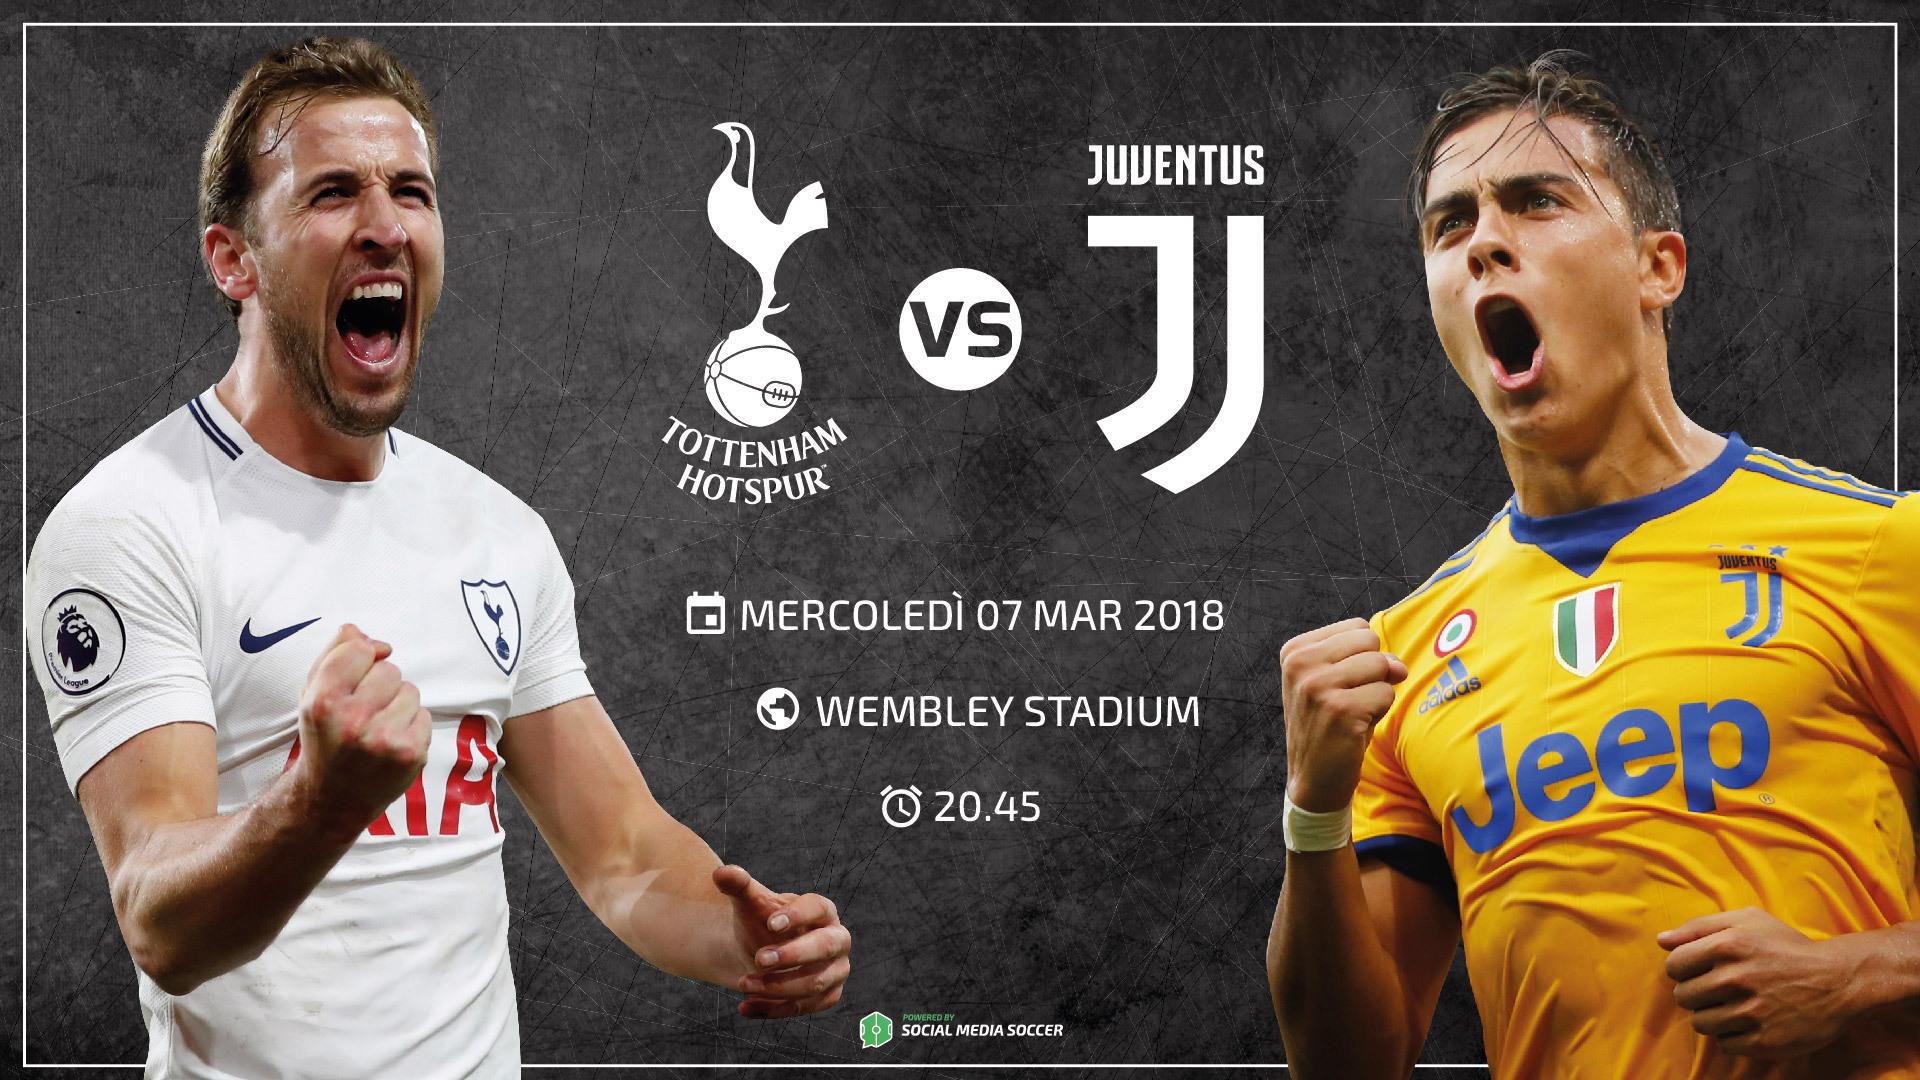 Tottenham-Juventus Social